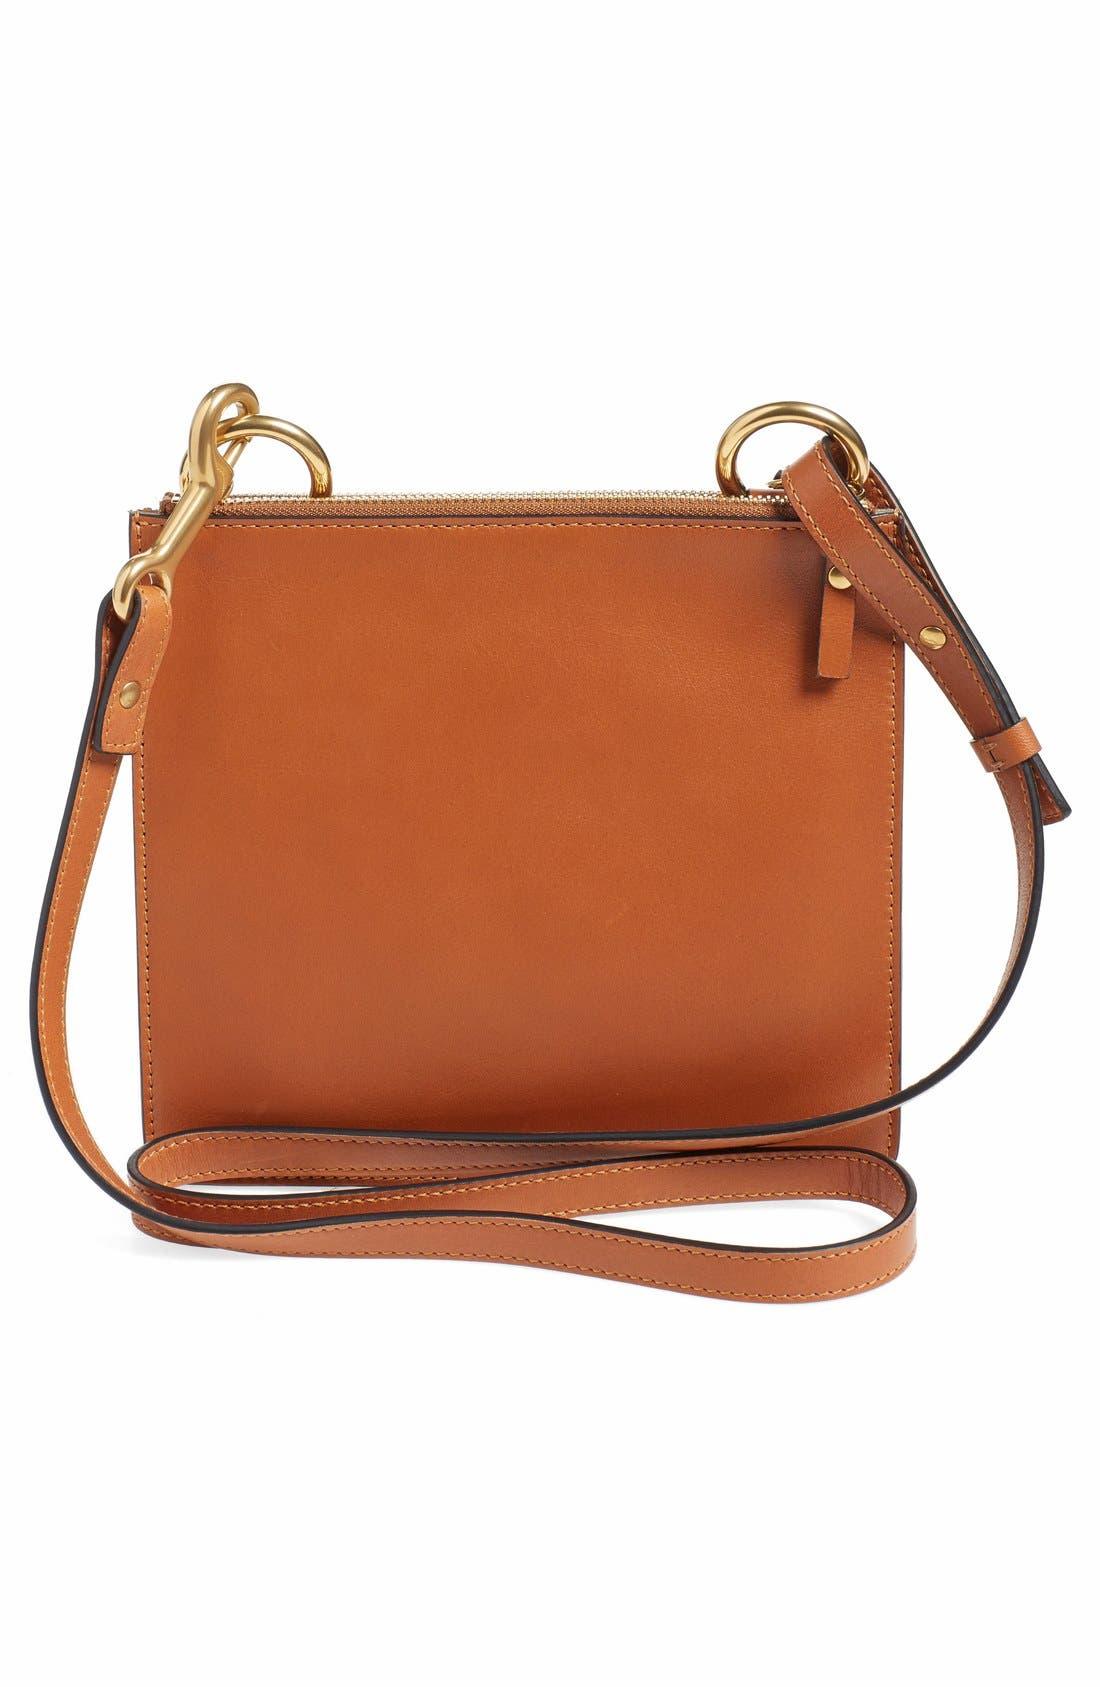 Alternate Image 2  - Chloé 'Small Jane' Tassel Suede & Leather Crossbody Bag